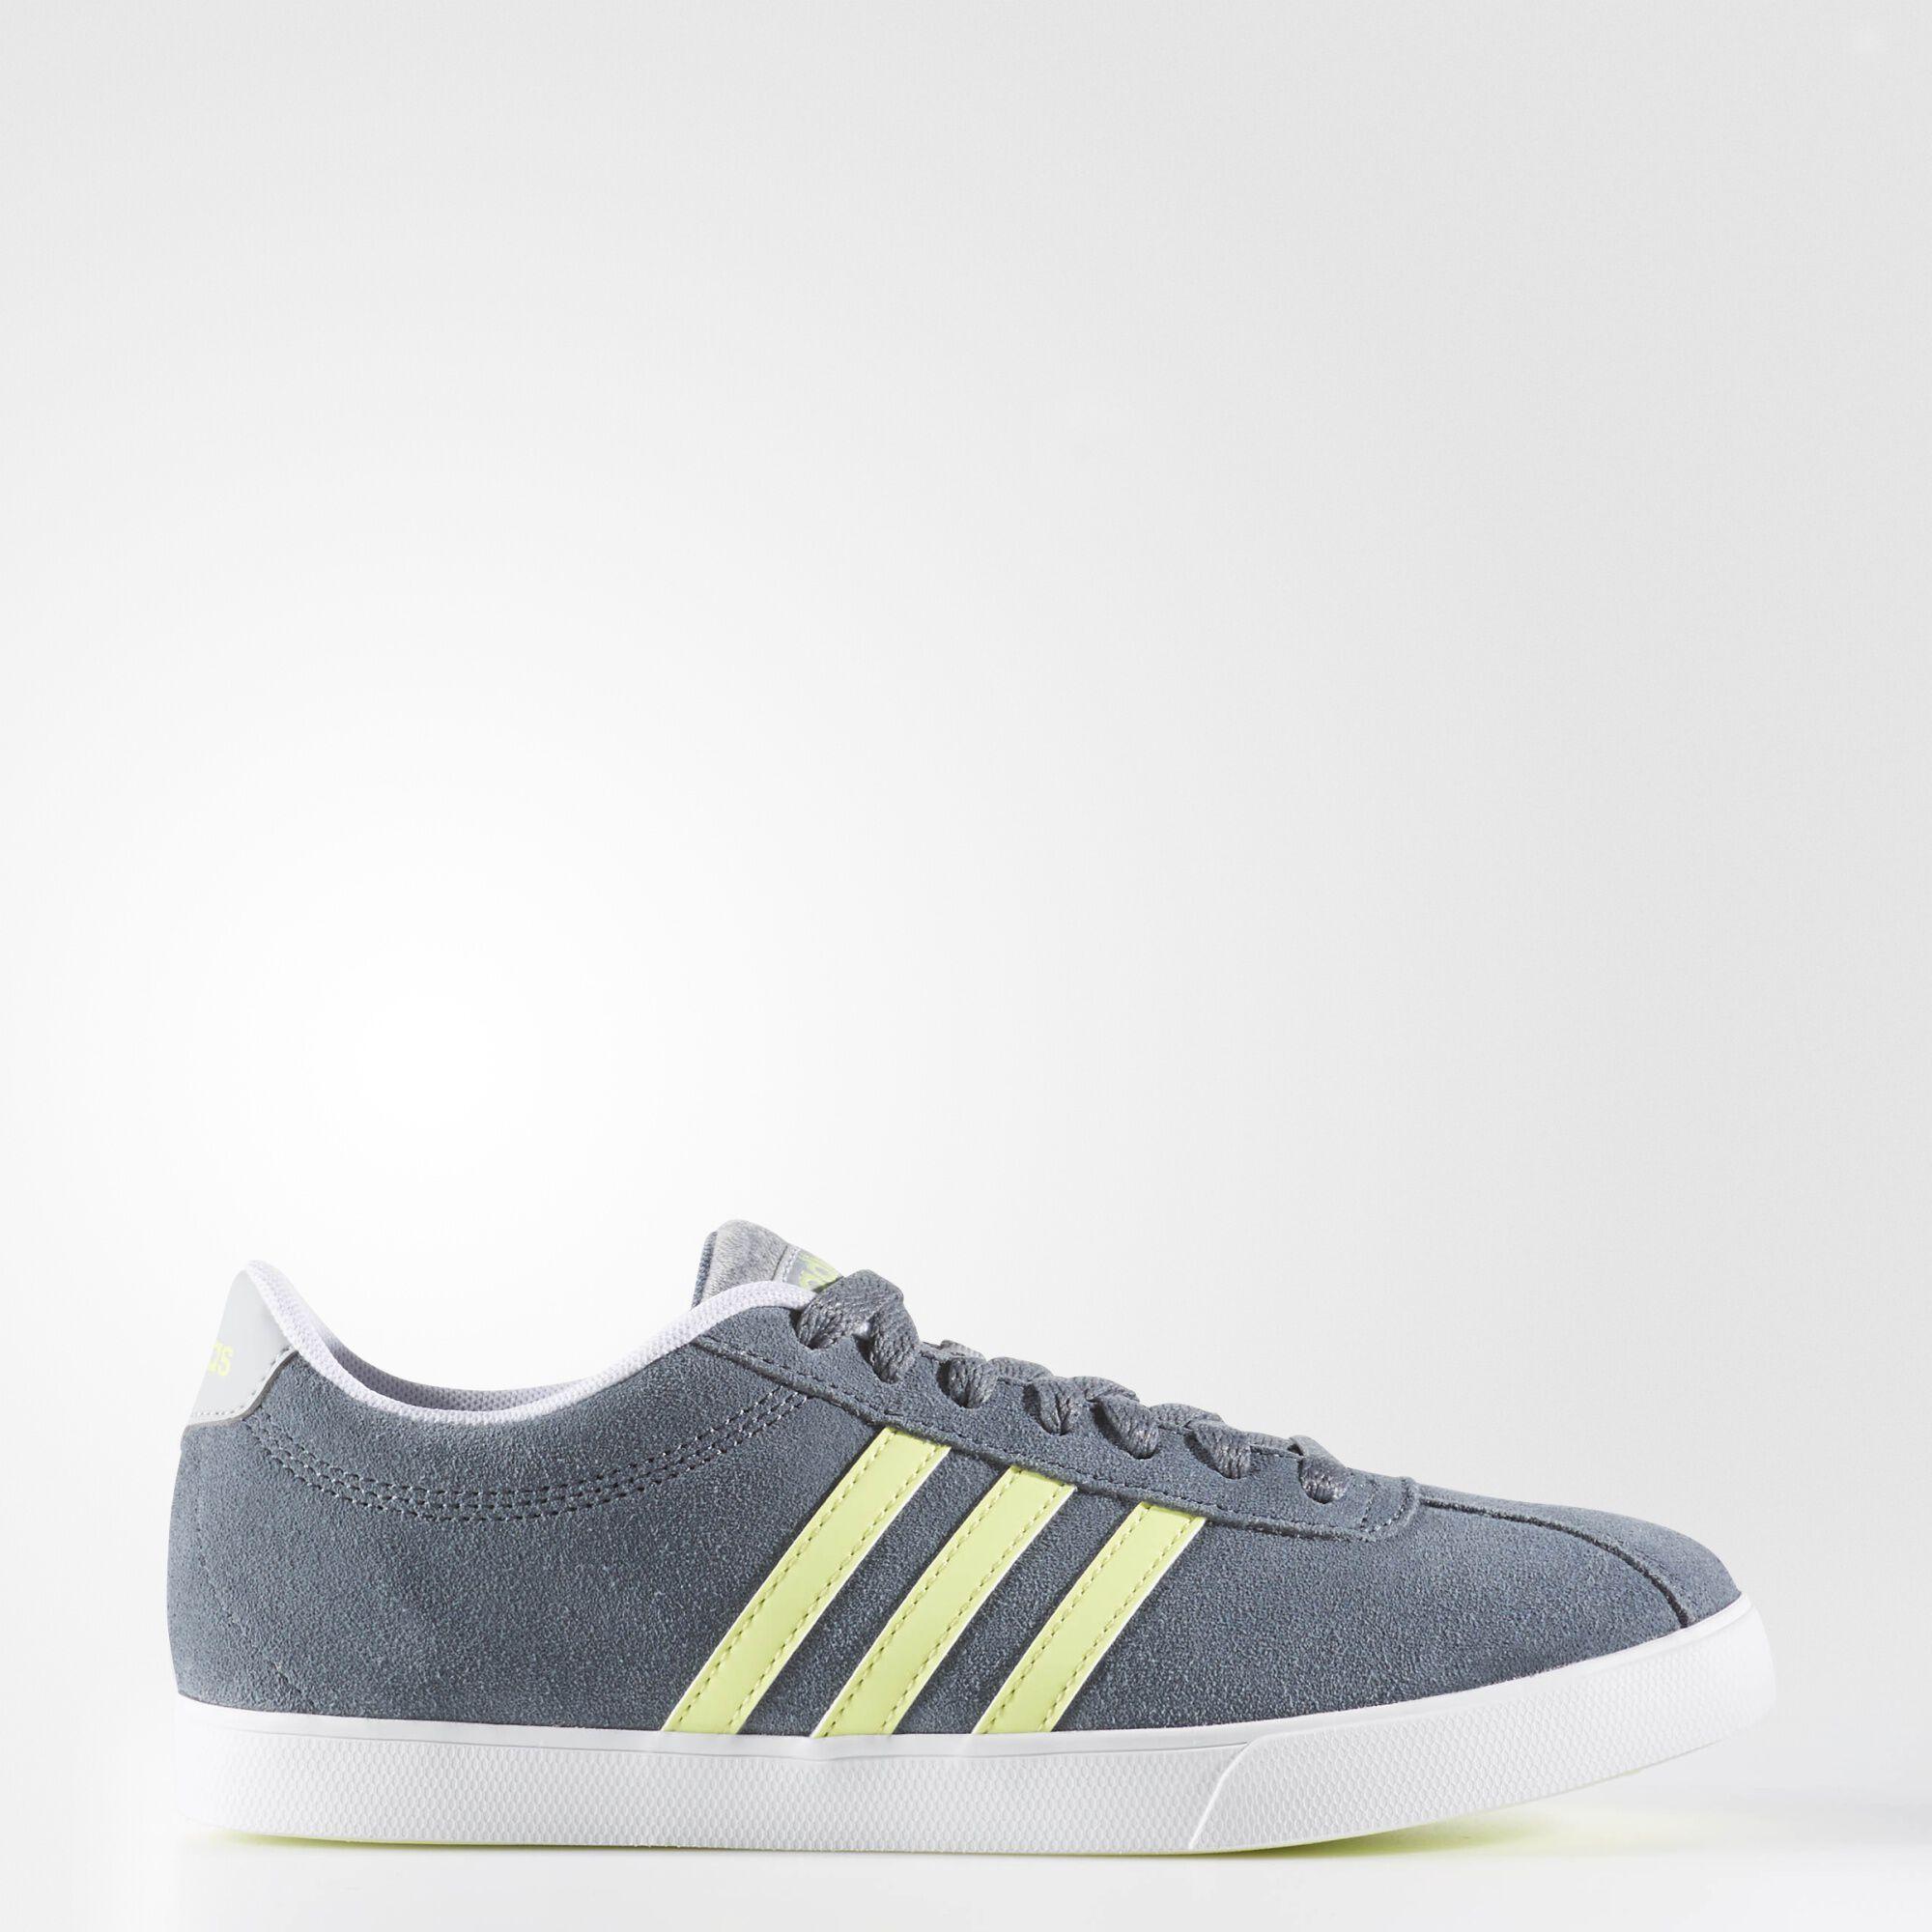 Buy Unisex Adidas Neo Pace Vs Low Shoes Navy Orange